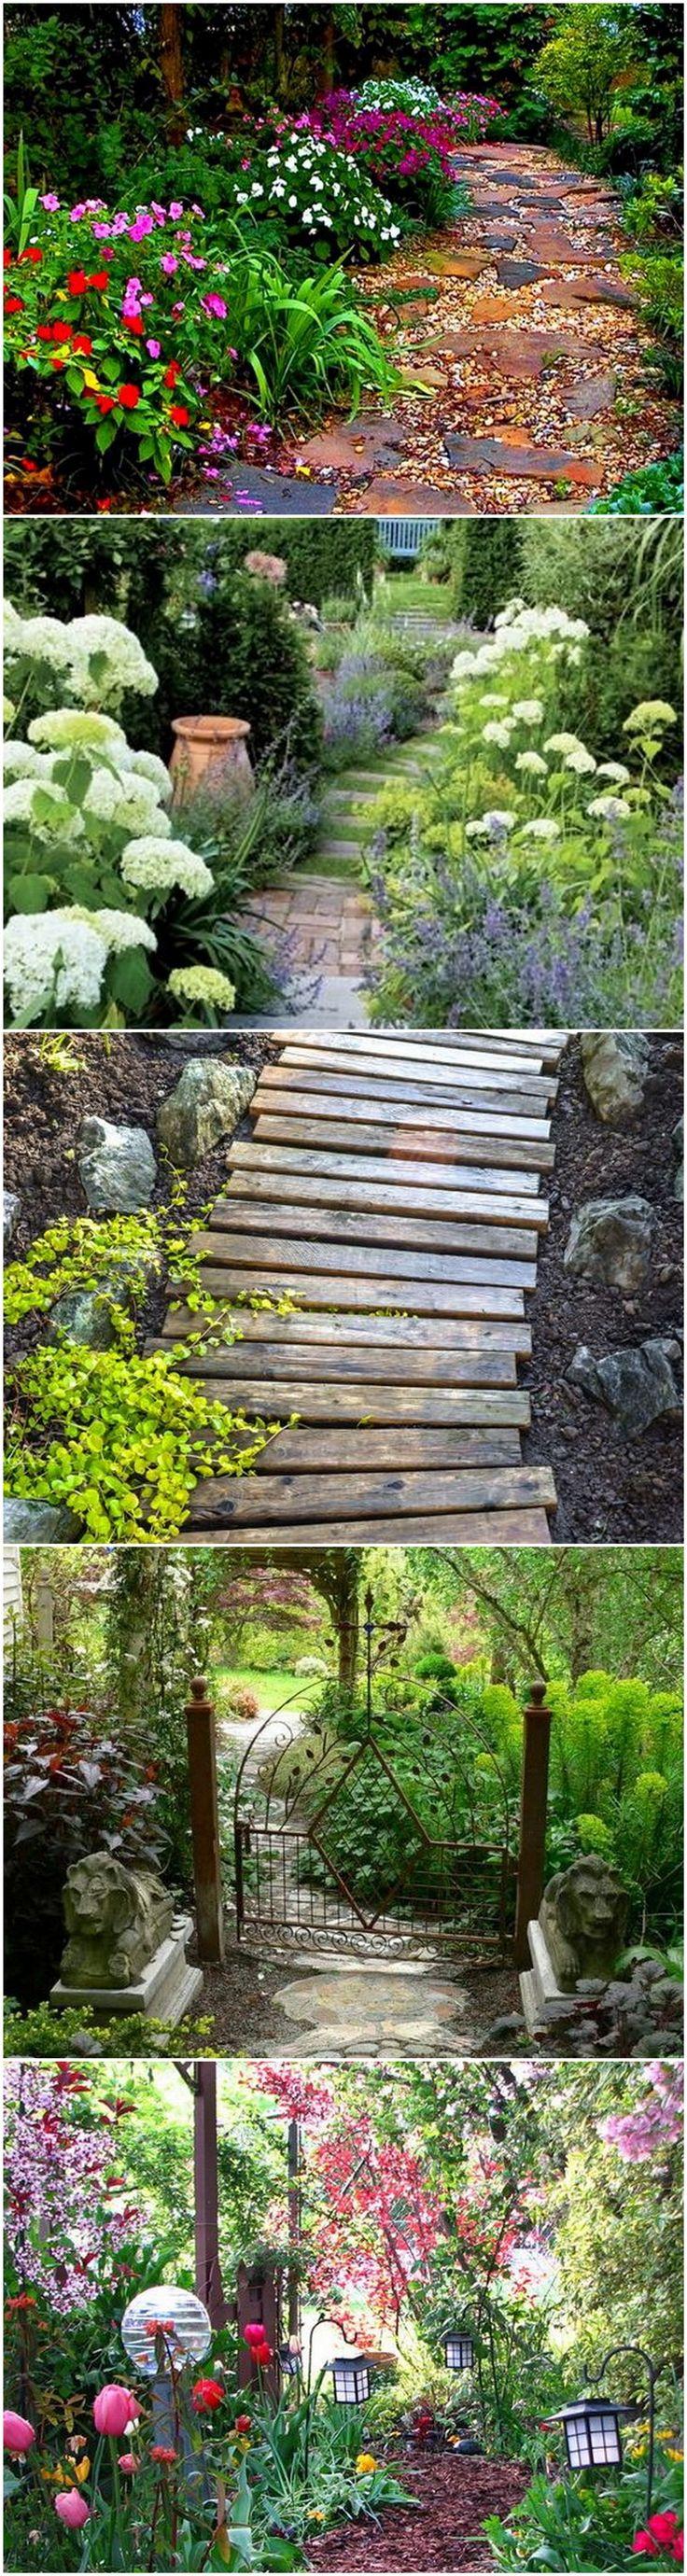 #paths #caminhos #garden #jardim